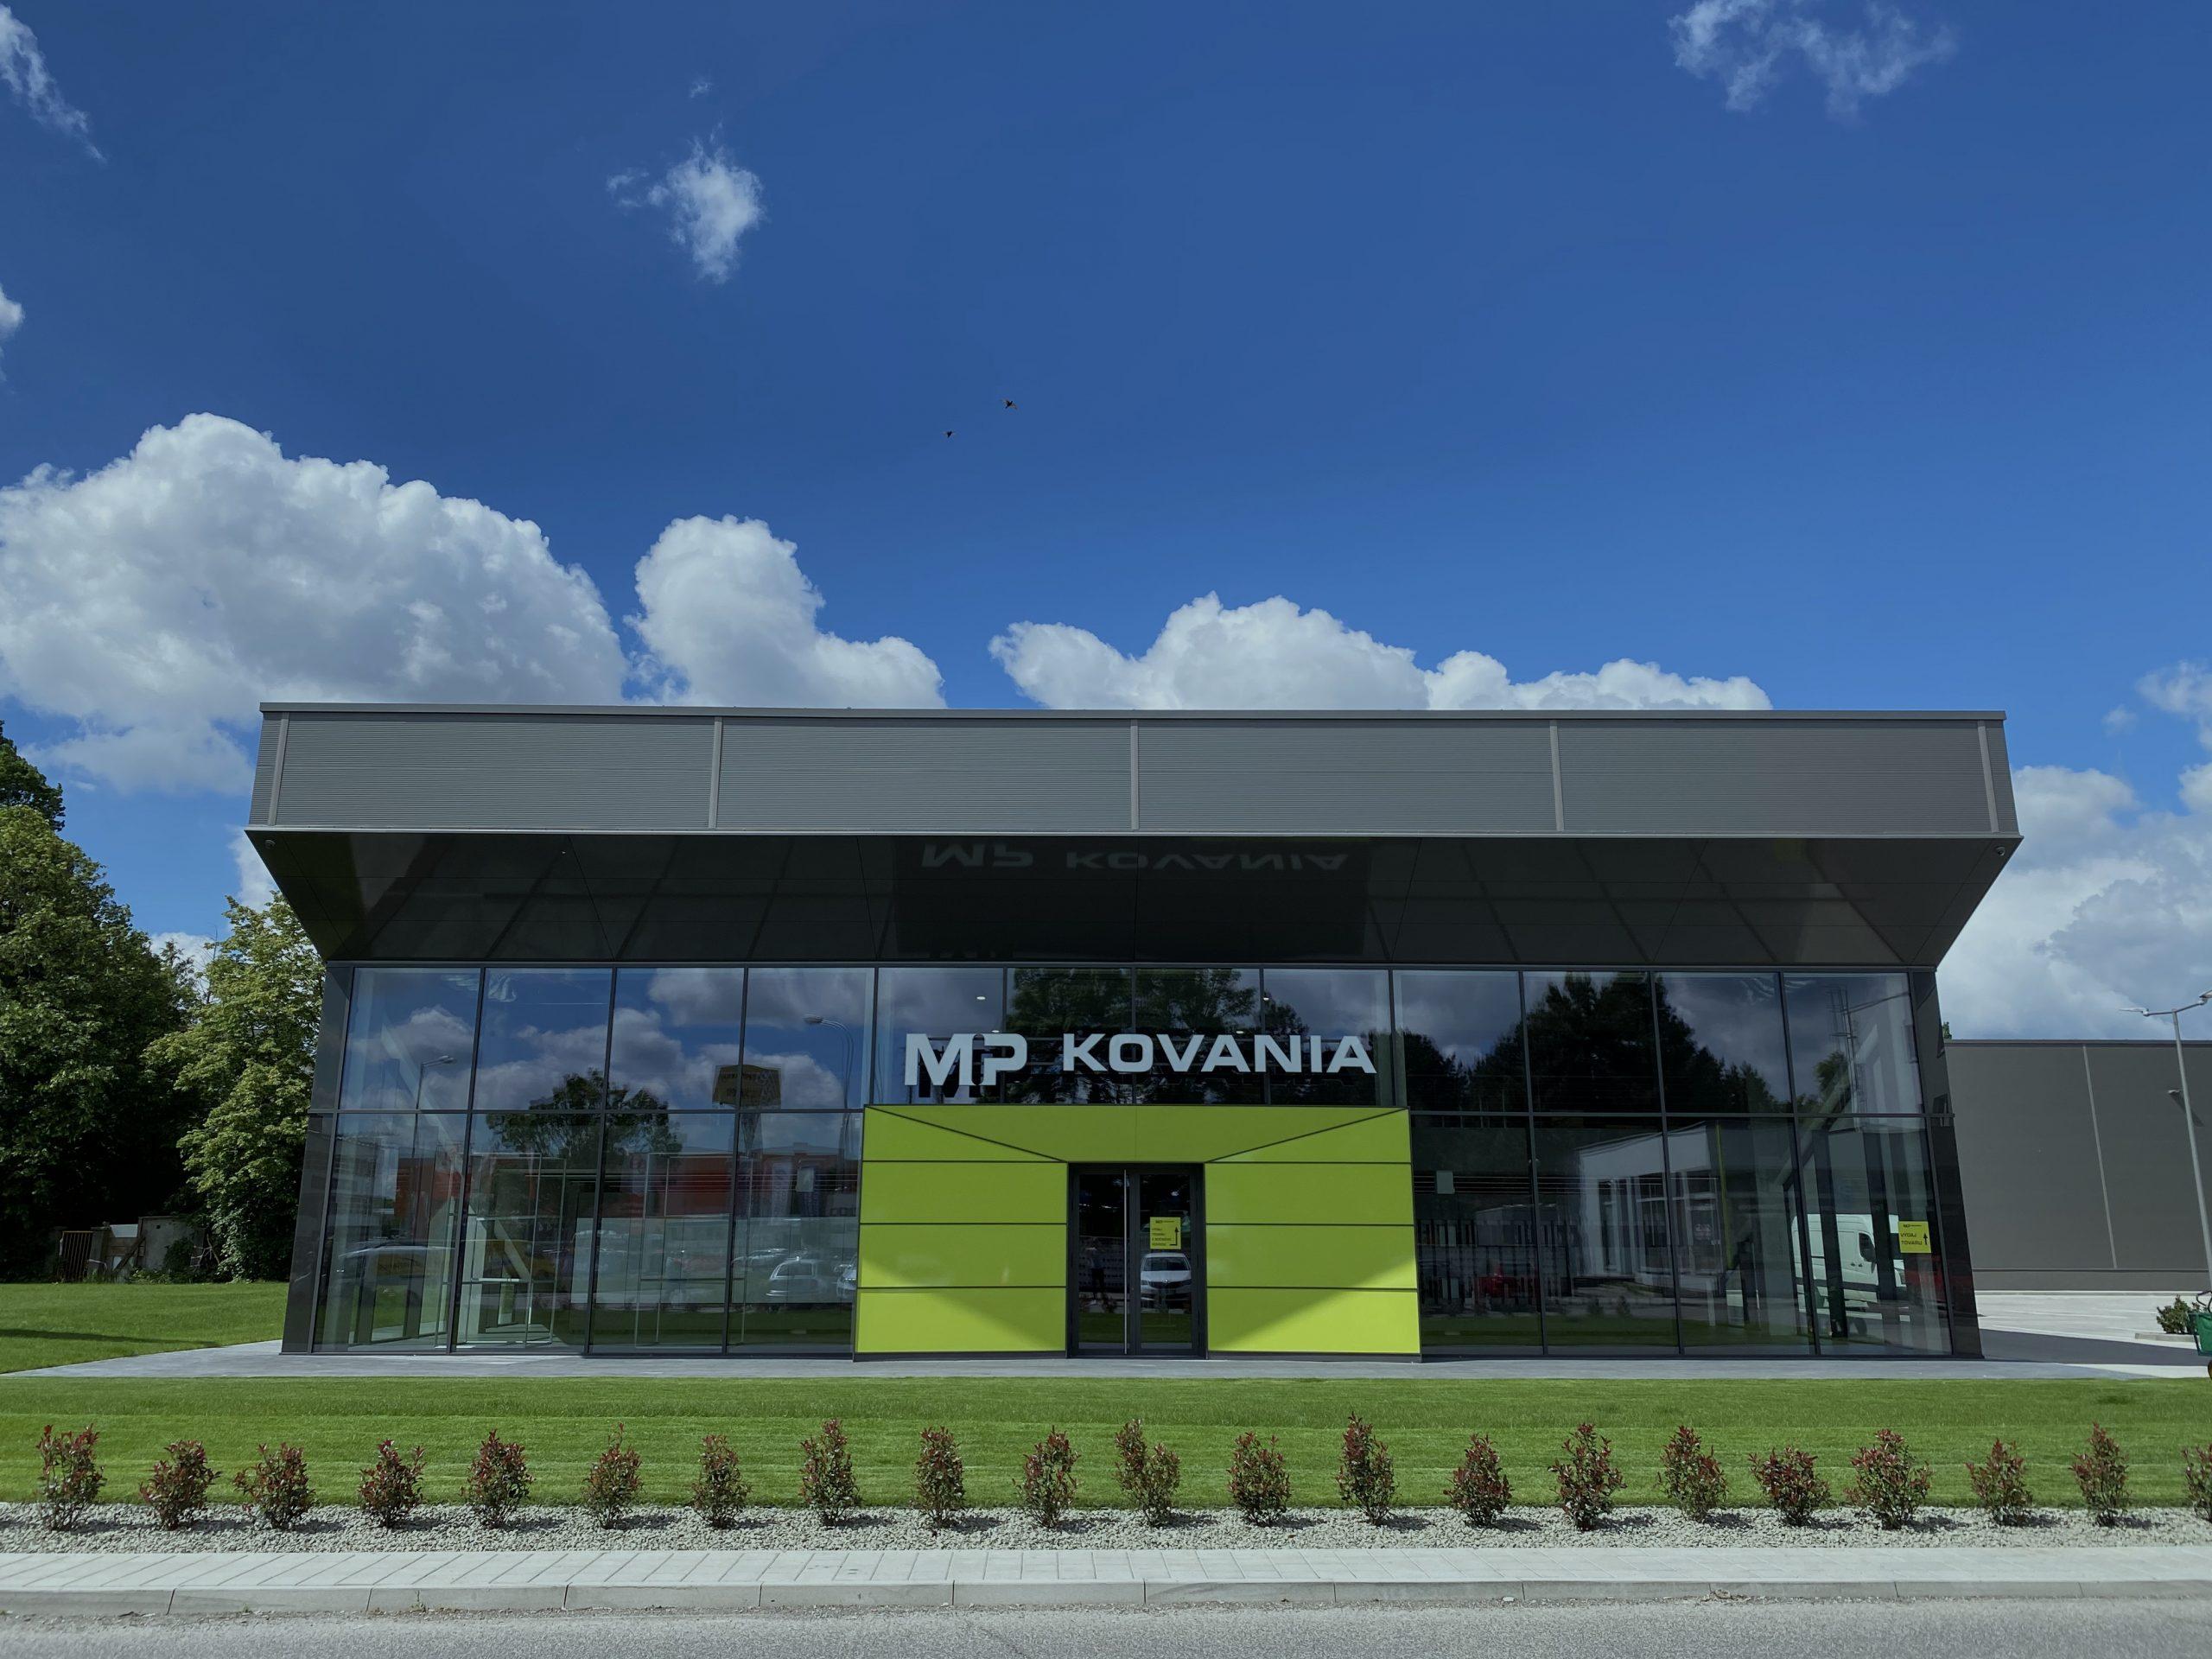 28-05-2021_MP KOVANIA (8)_titulna